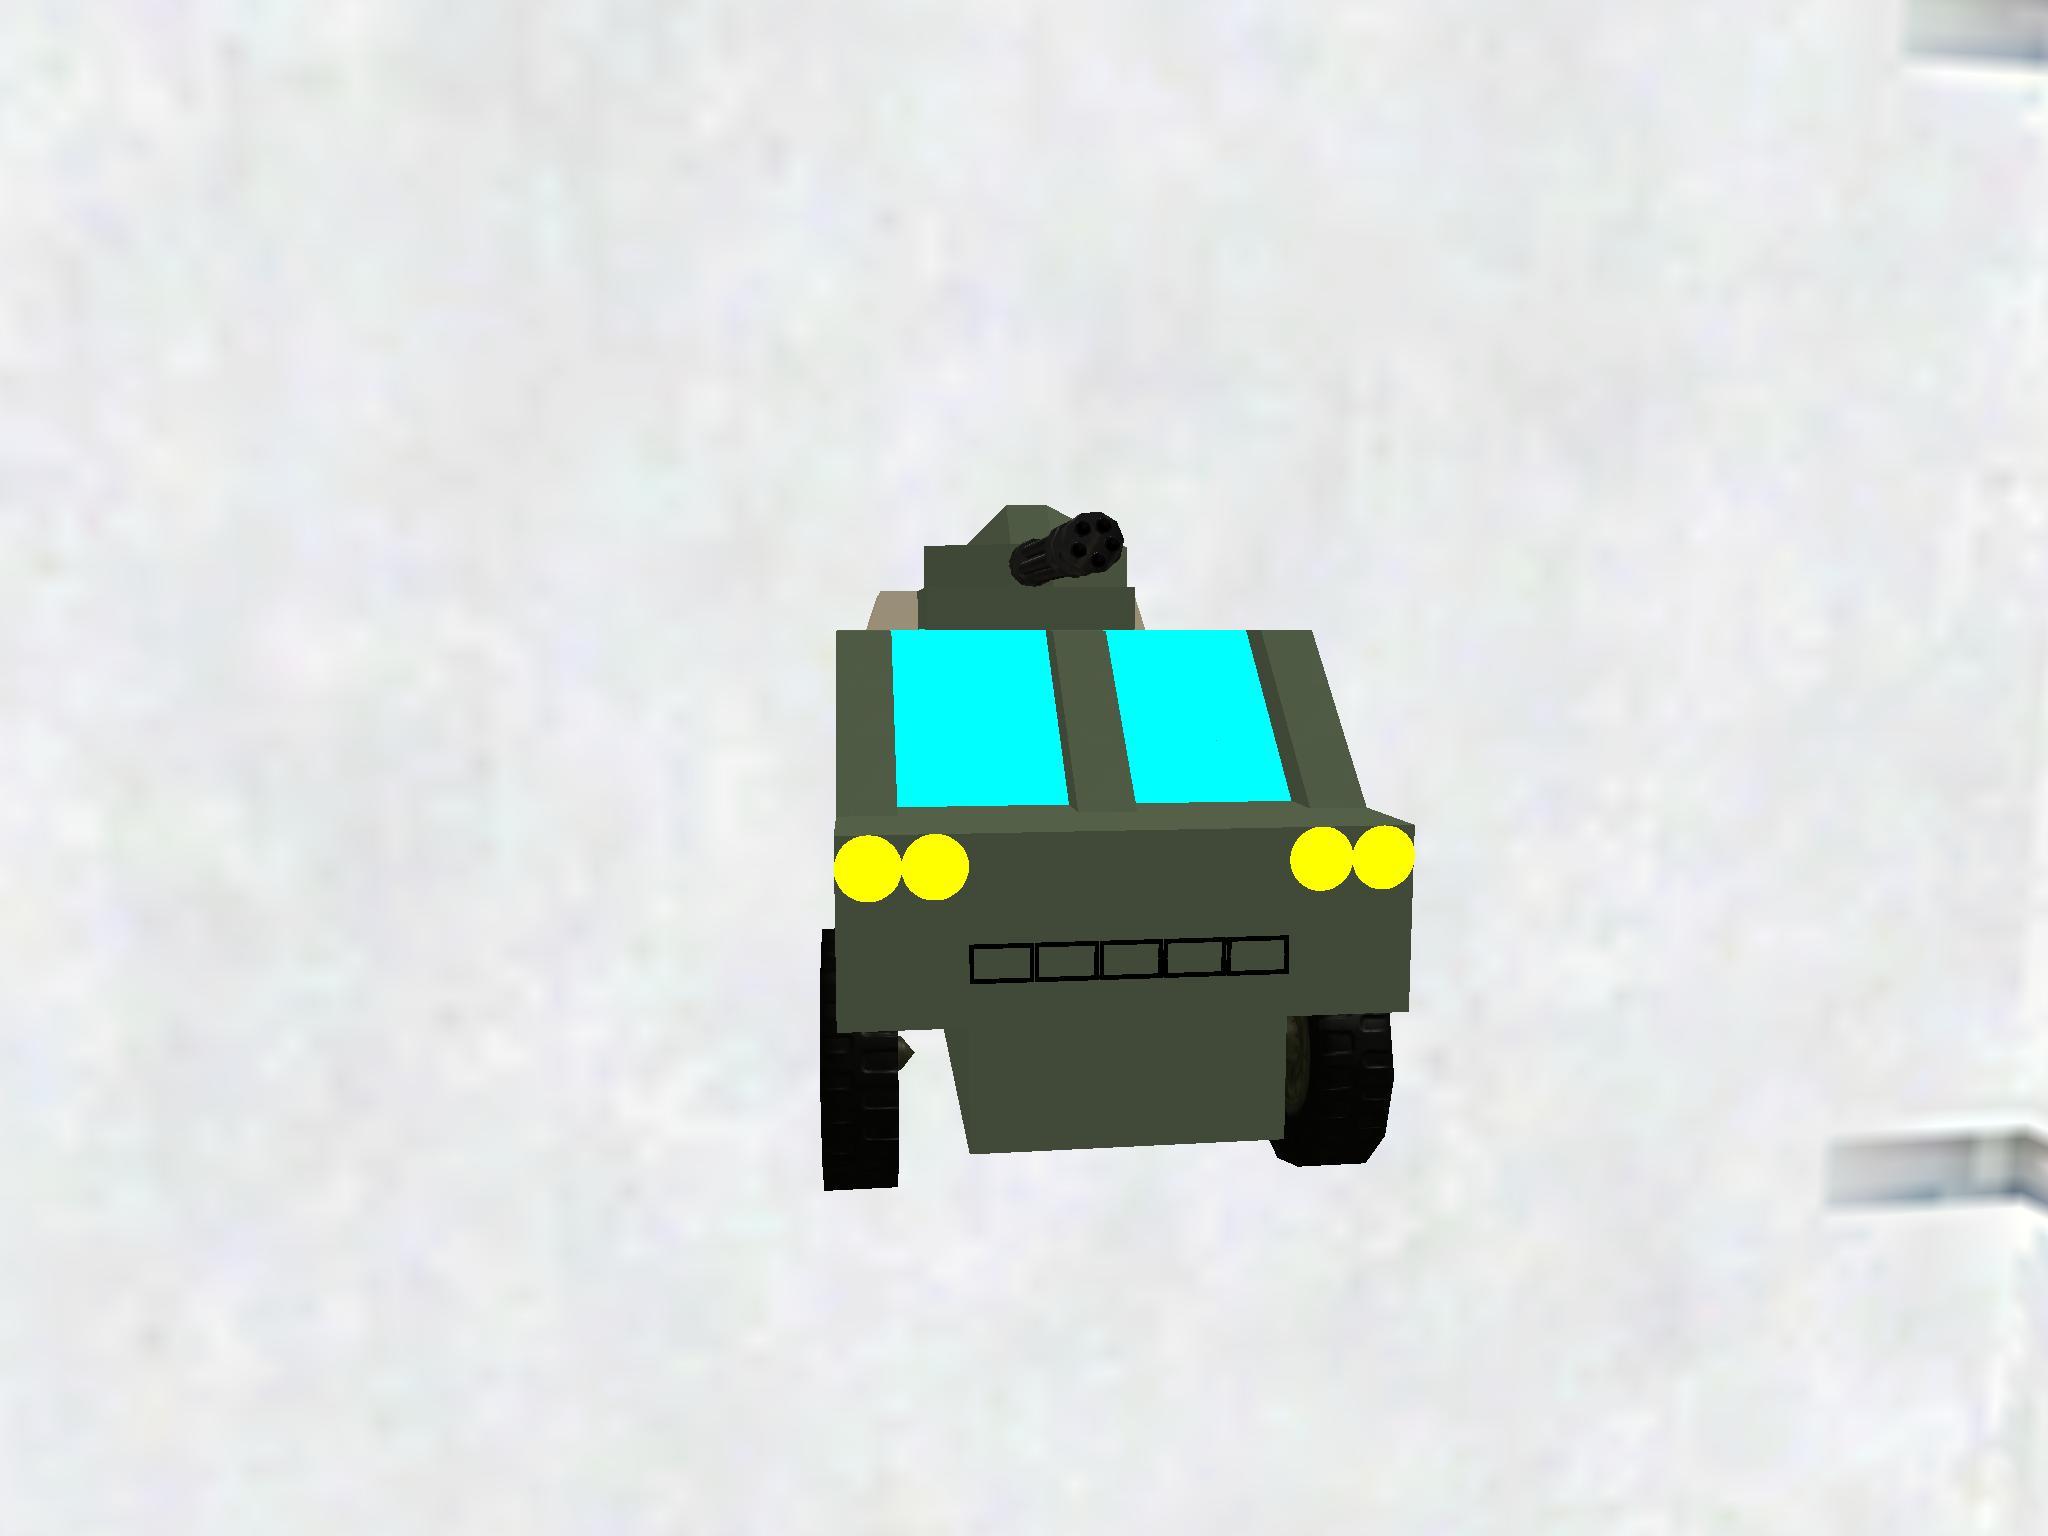 Armed garbage truck